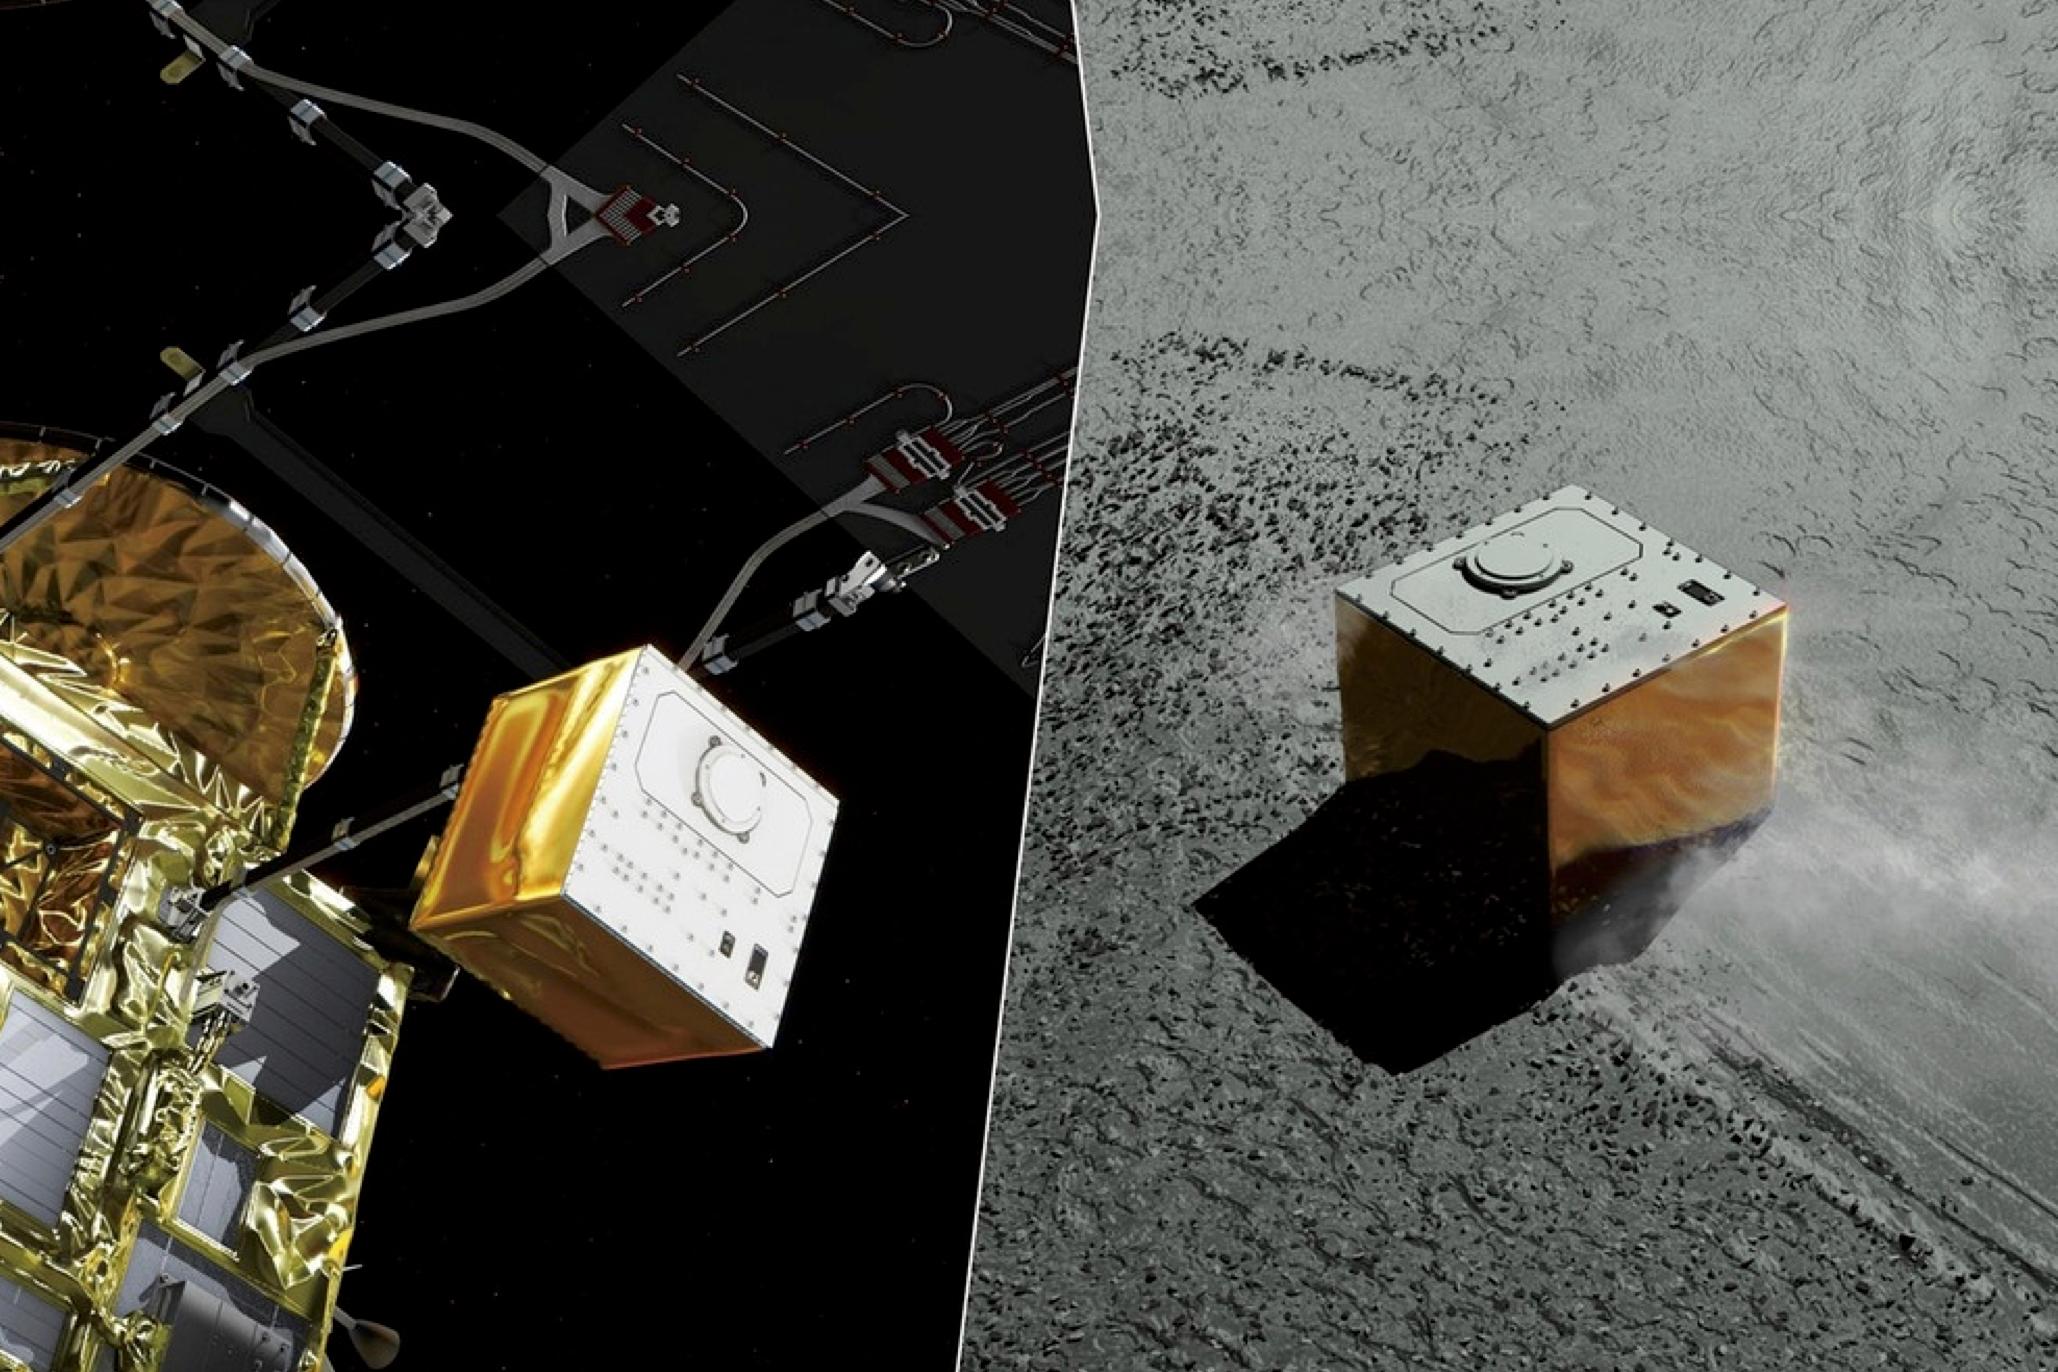 Asteroidlandaren Mascot släpps från moderfarkosten